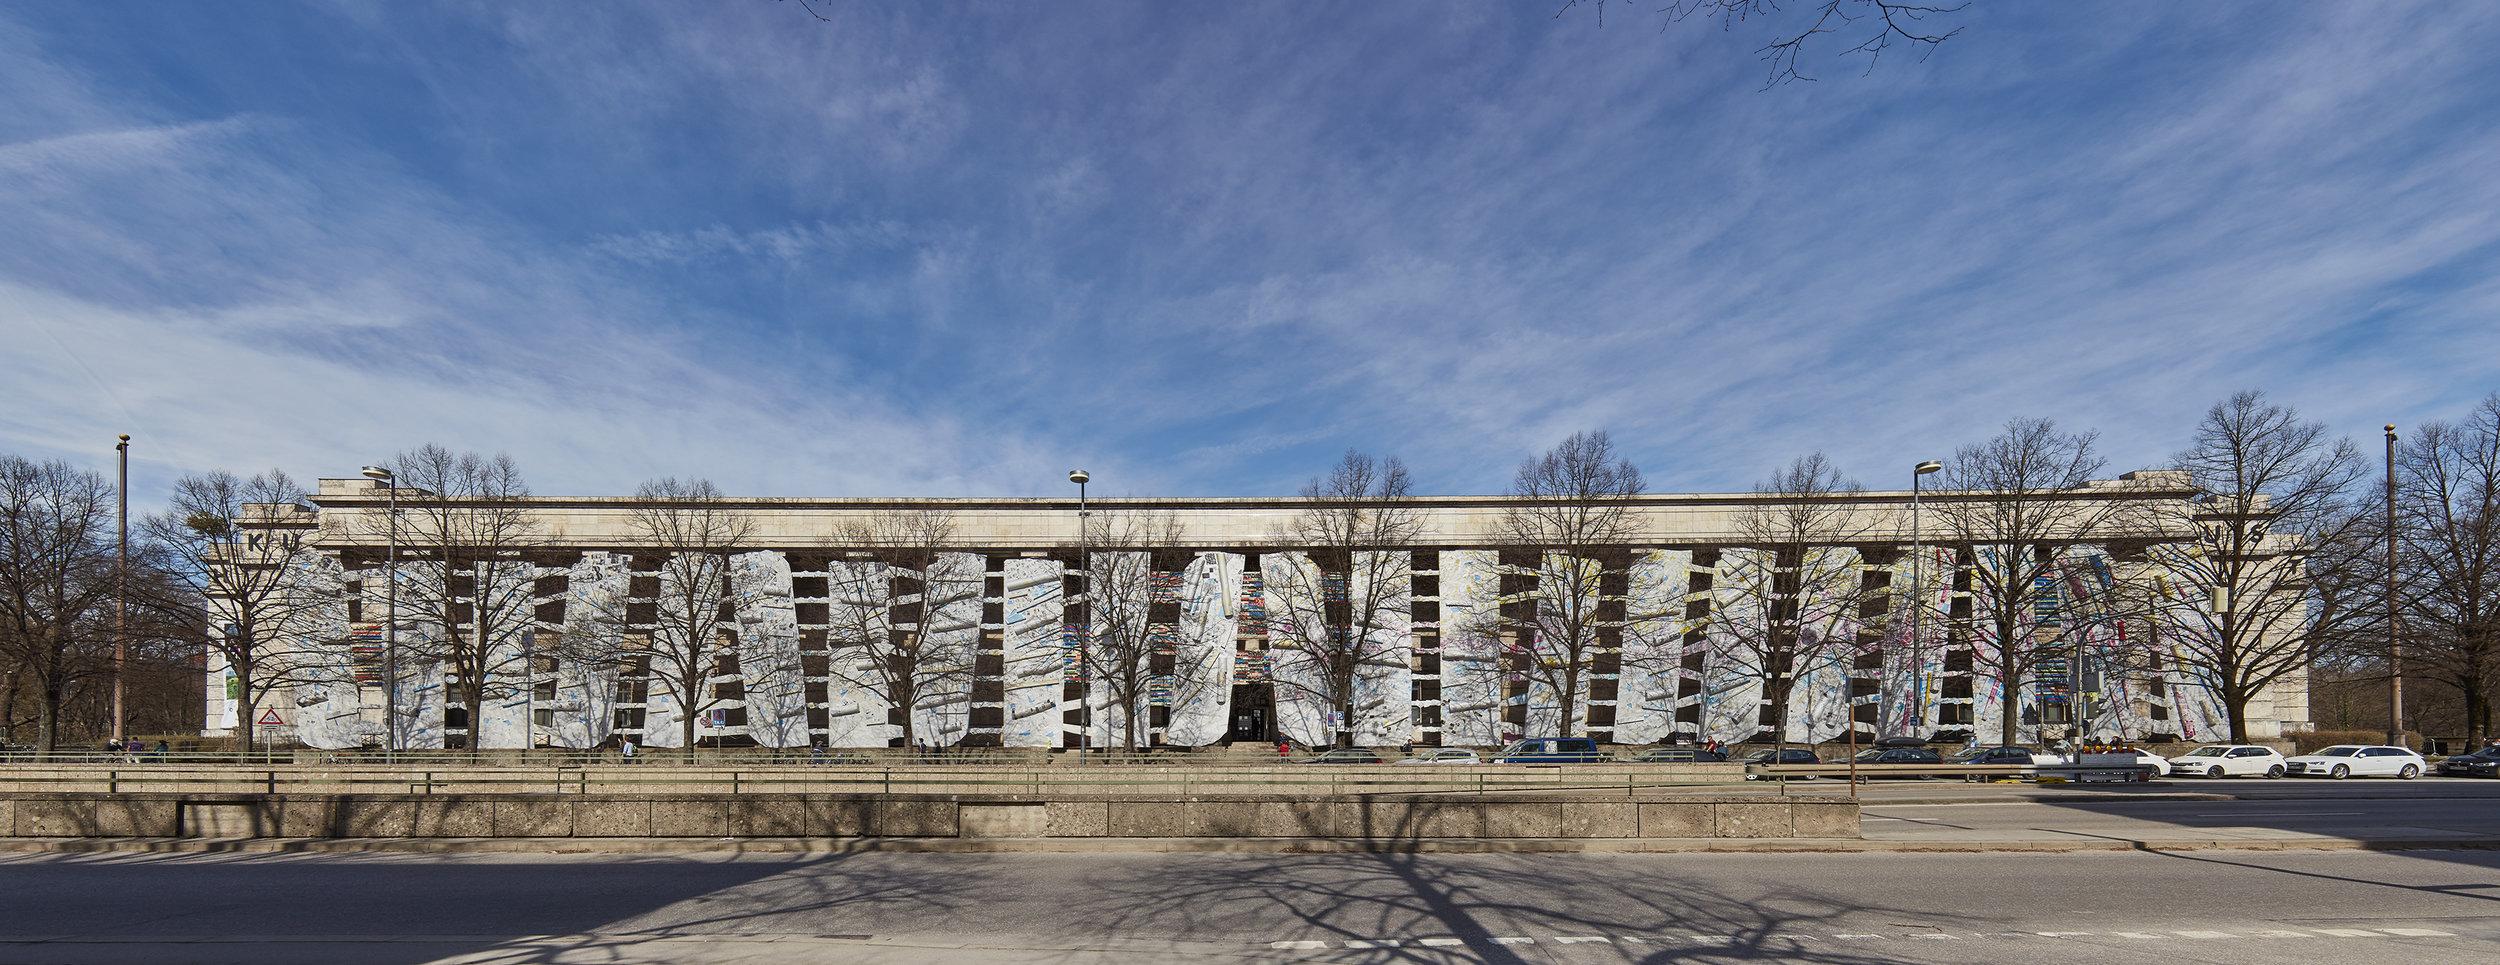 El Anatsui and the Institutional Politics of Munich's Haus der Kunst